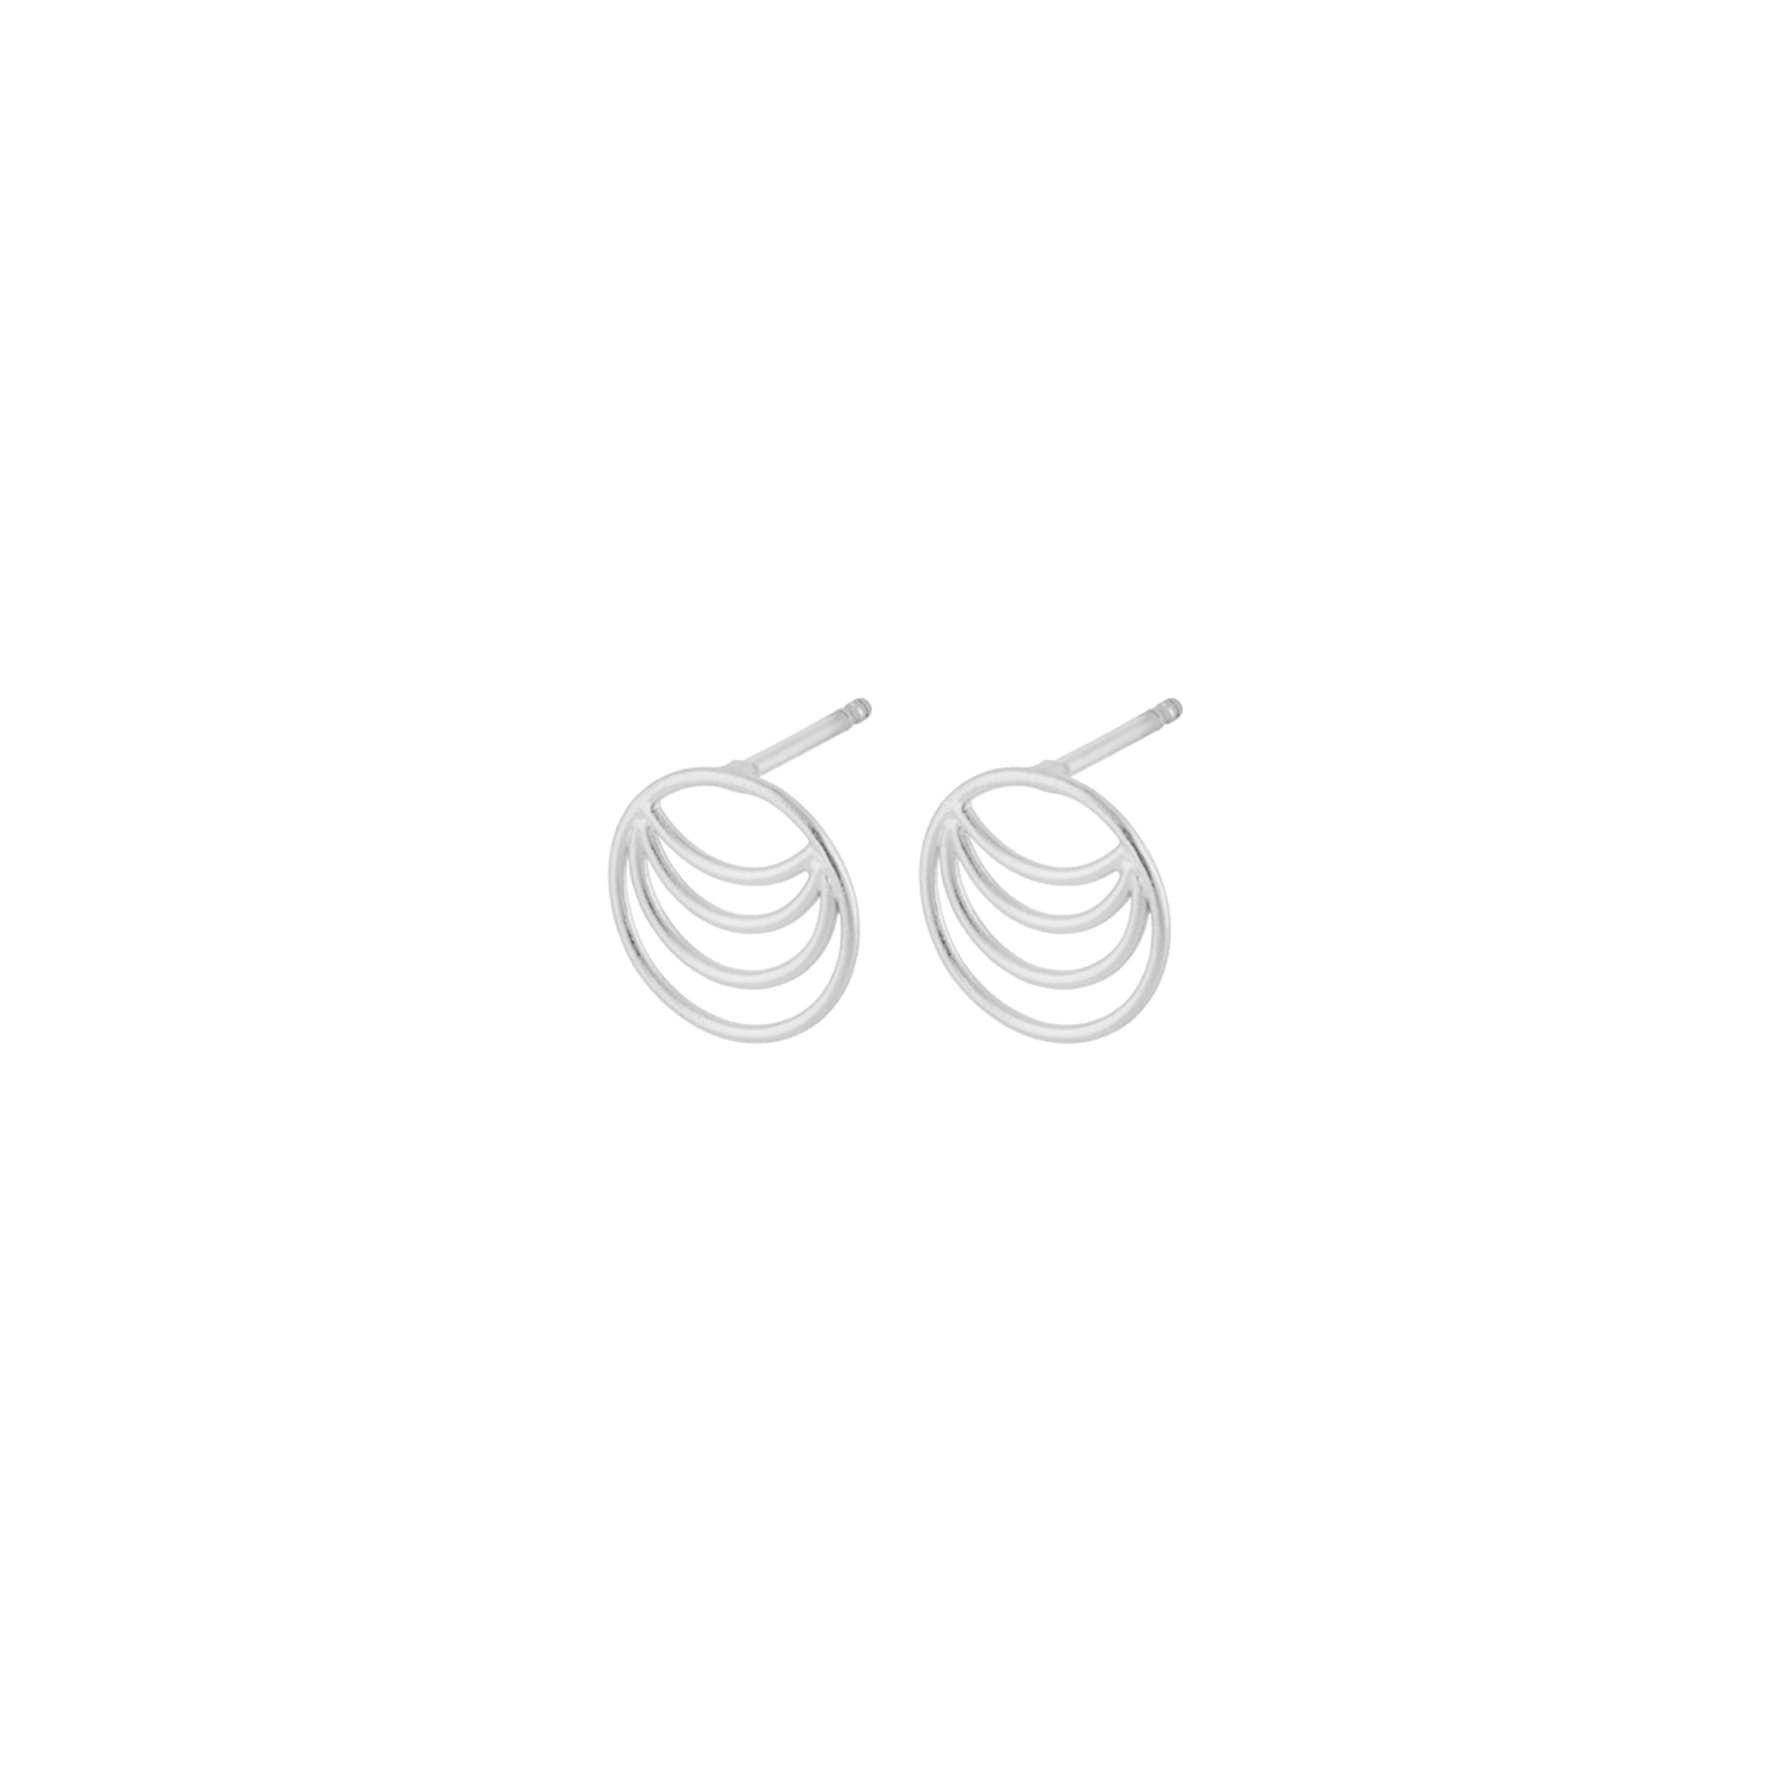 Silhouette Earsticks von Pernille Corydon in Silber Sterling 925